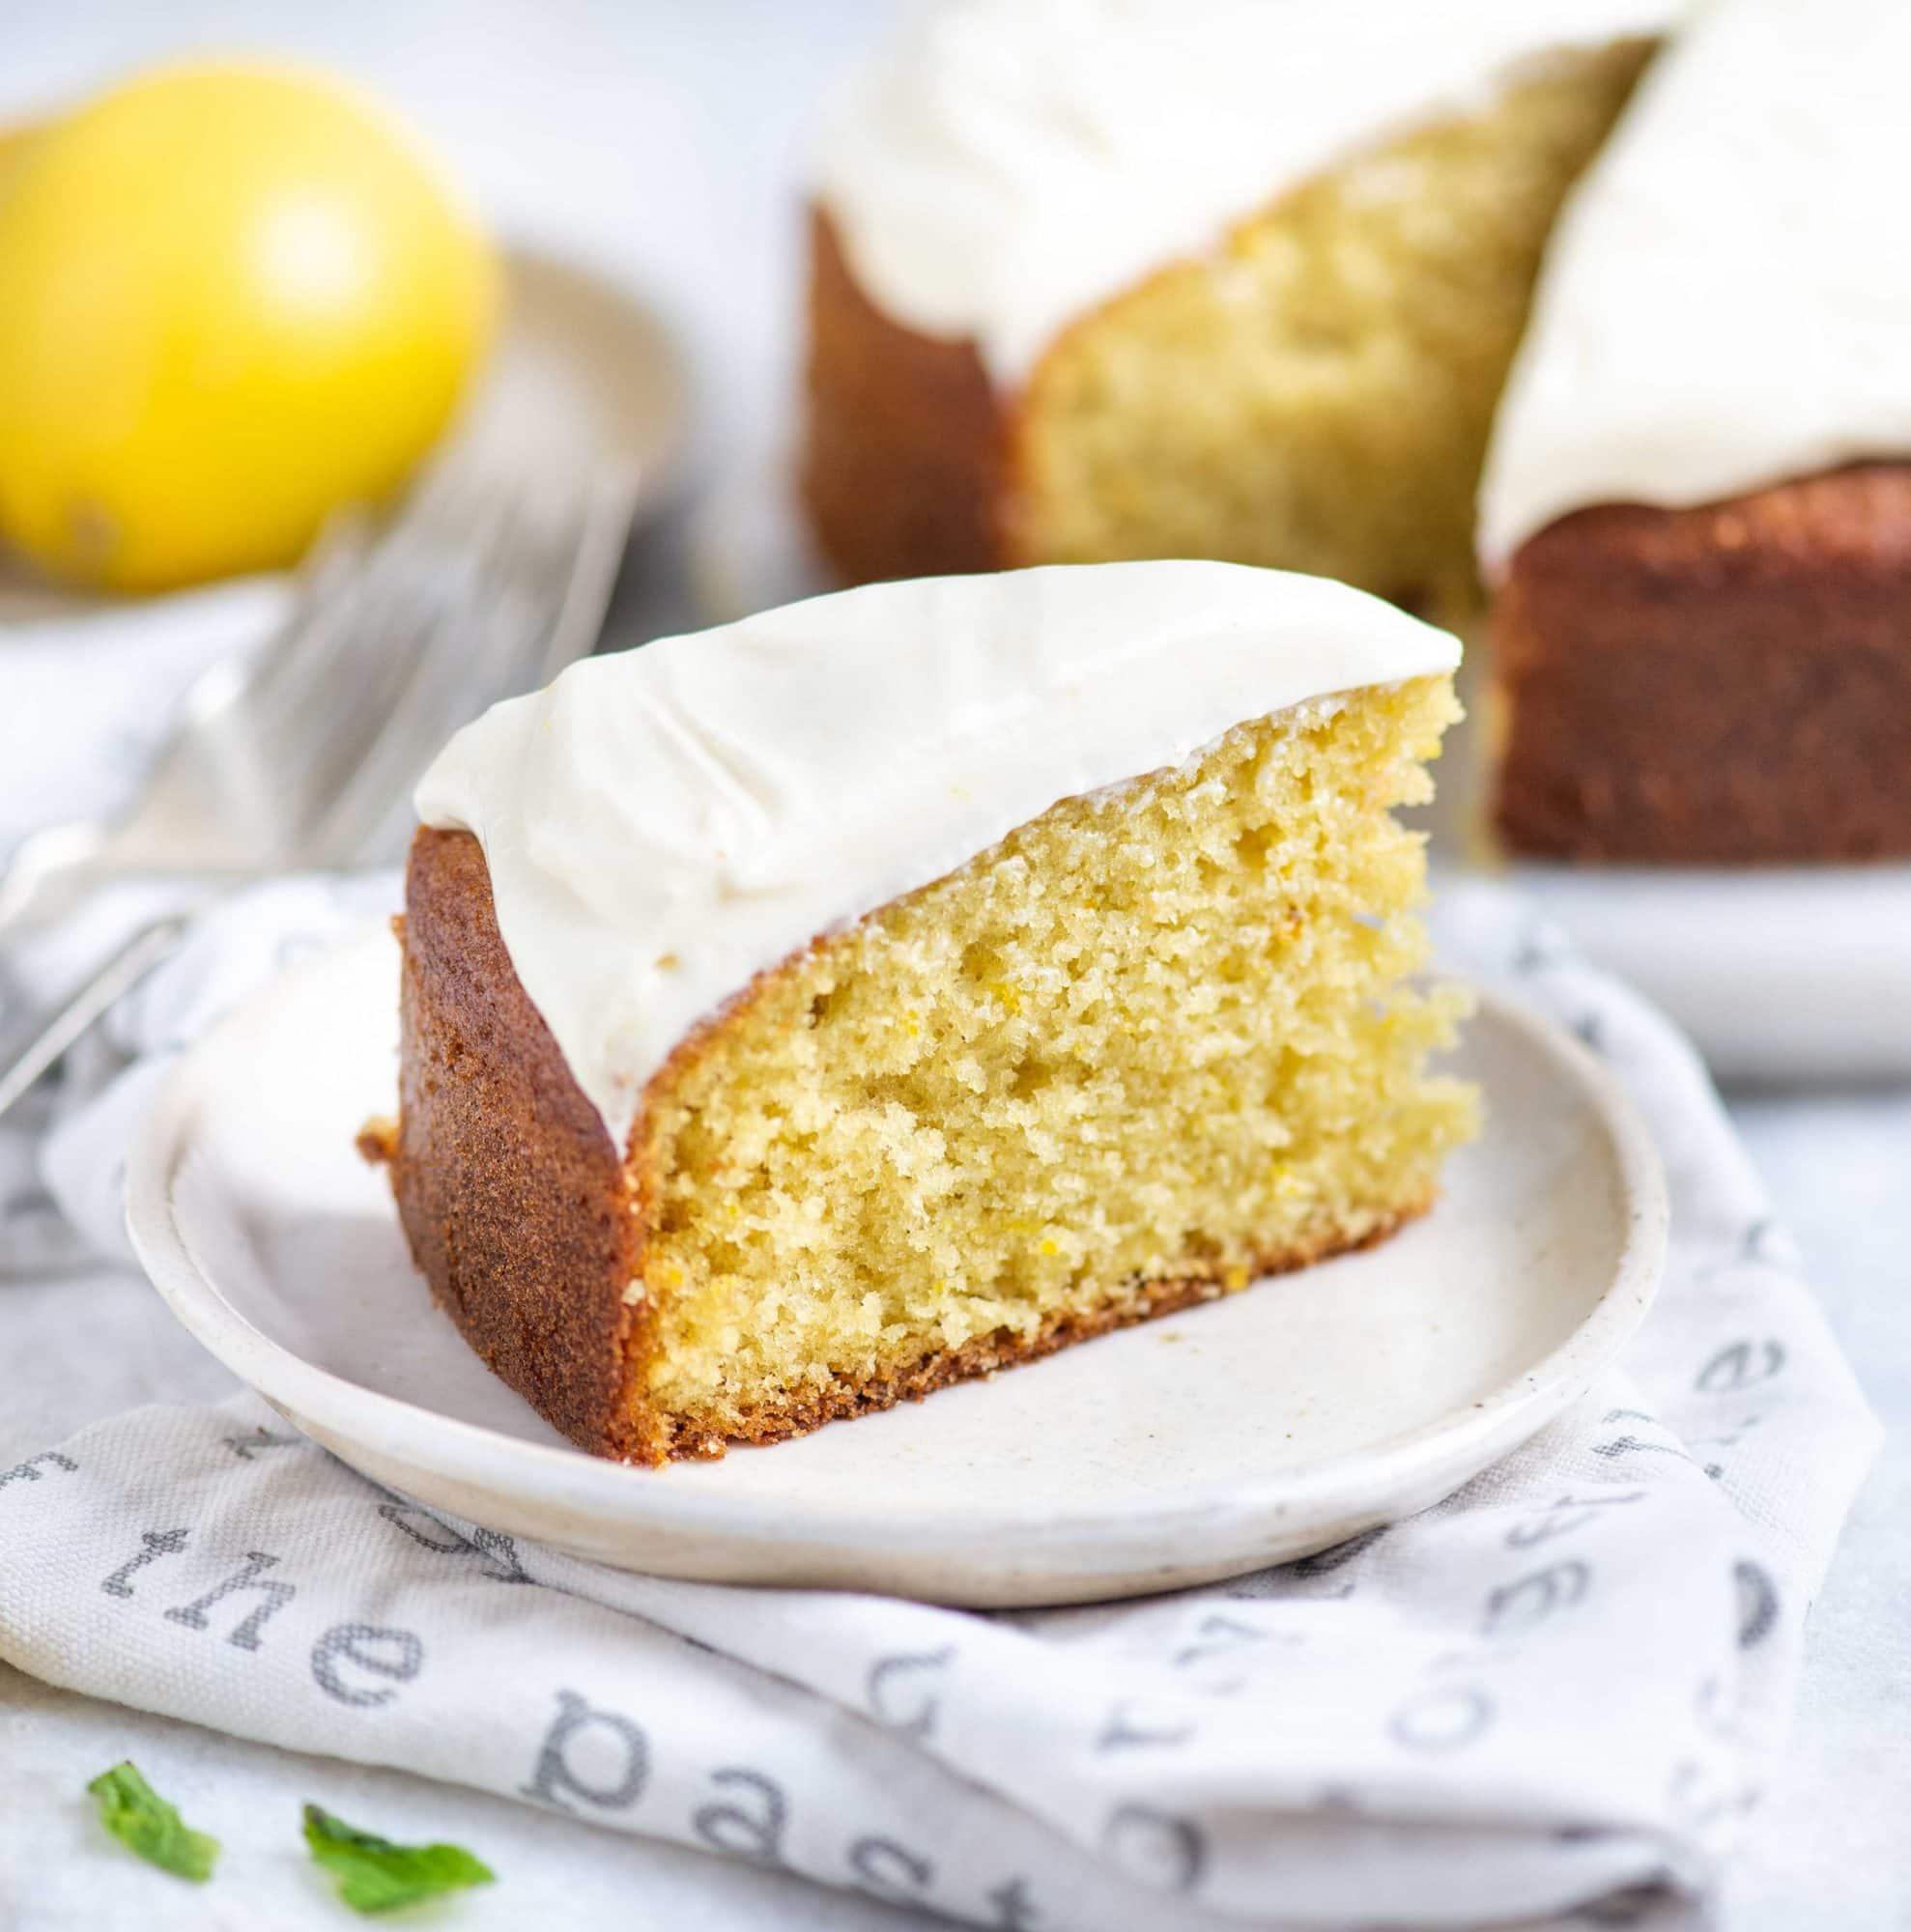 Soft fluffy and moist lemon cake with lemon cream cheese frosting